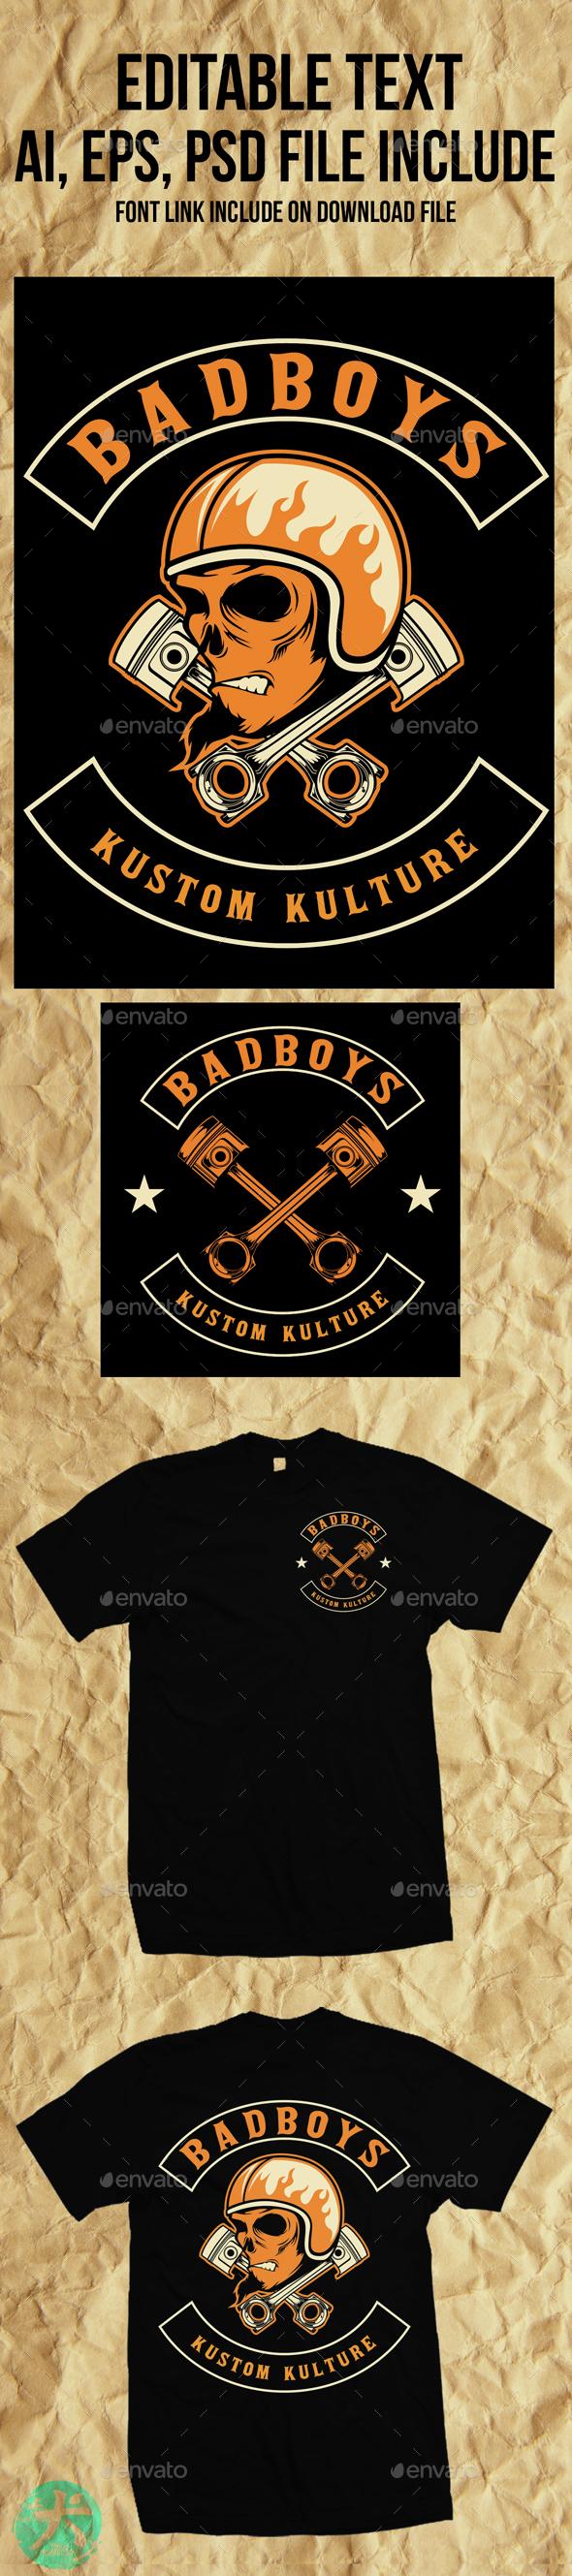 BadBoys - Clean Designs